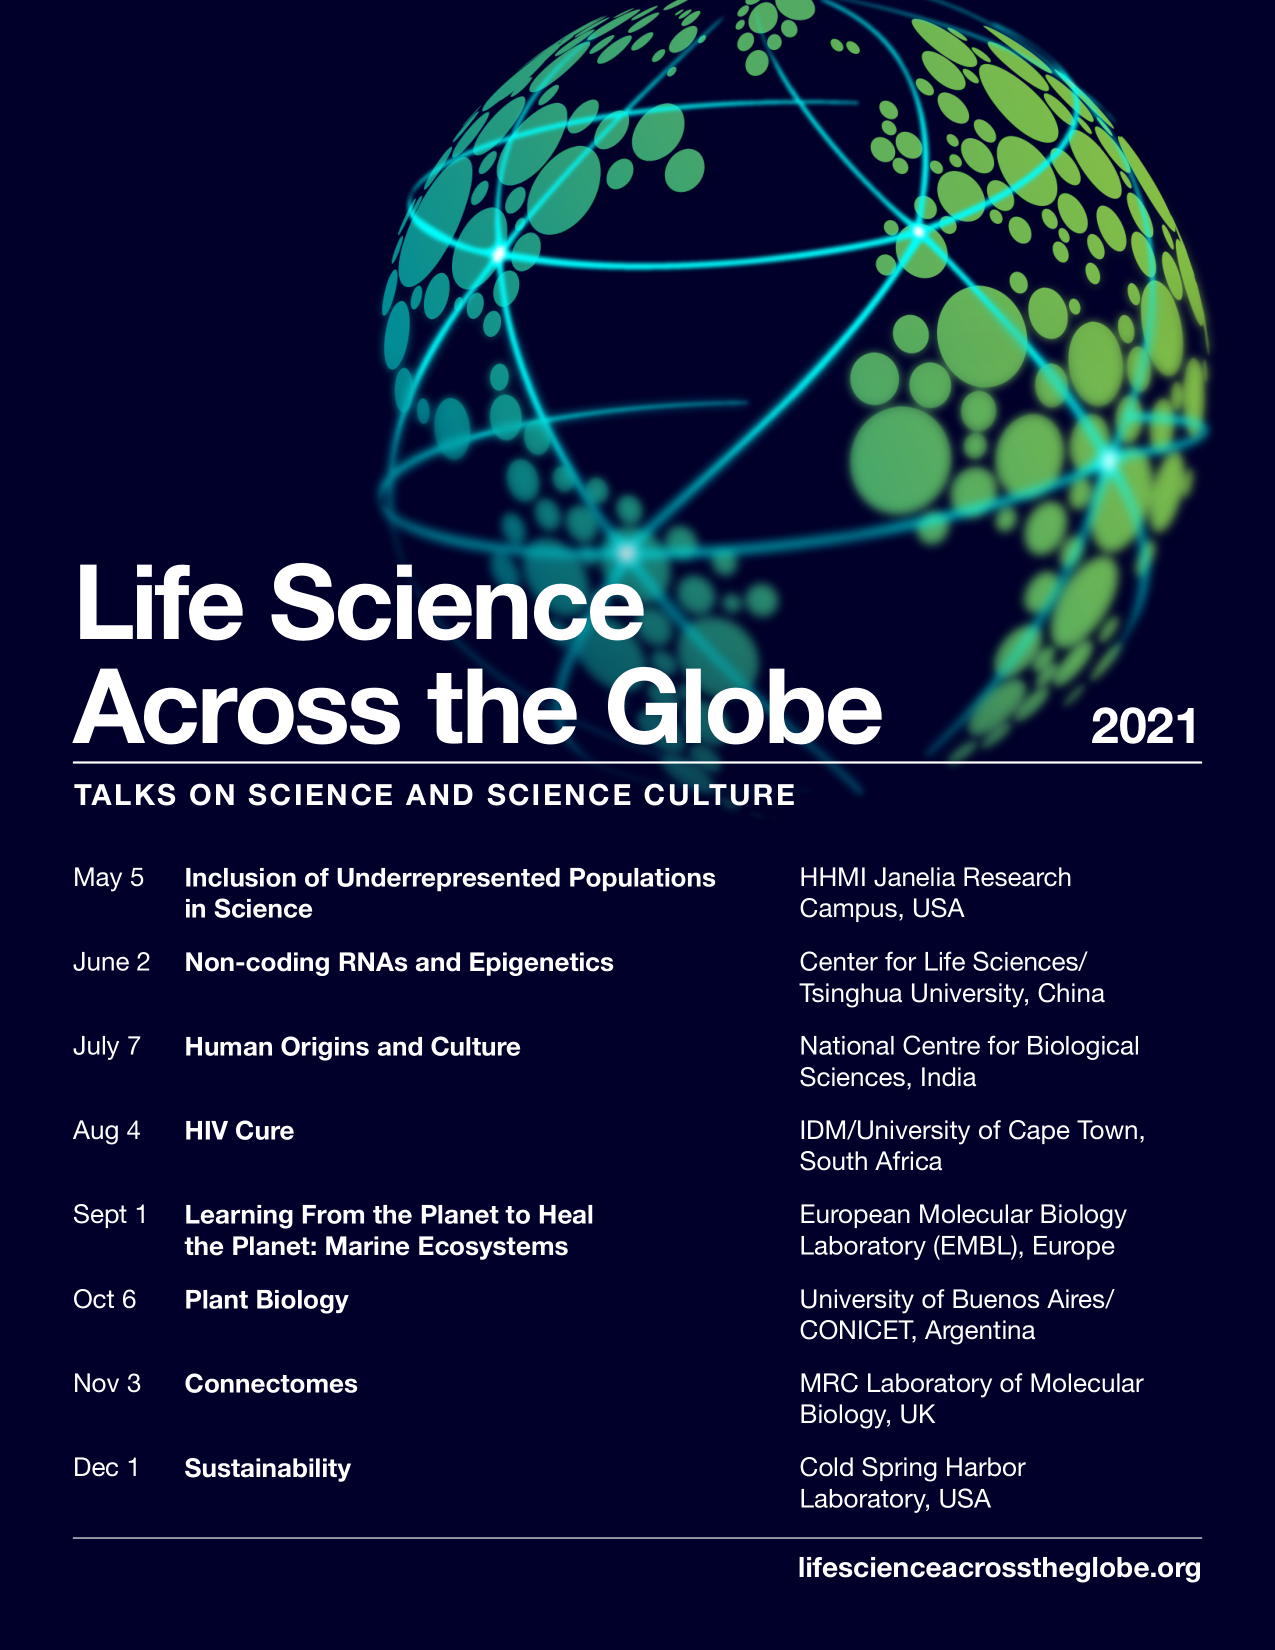 Life Science Across the Globe returns!